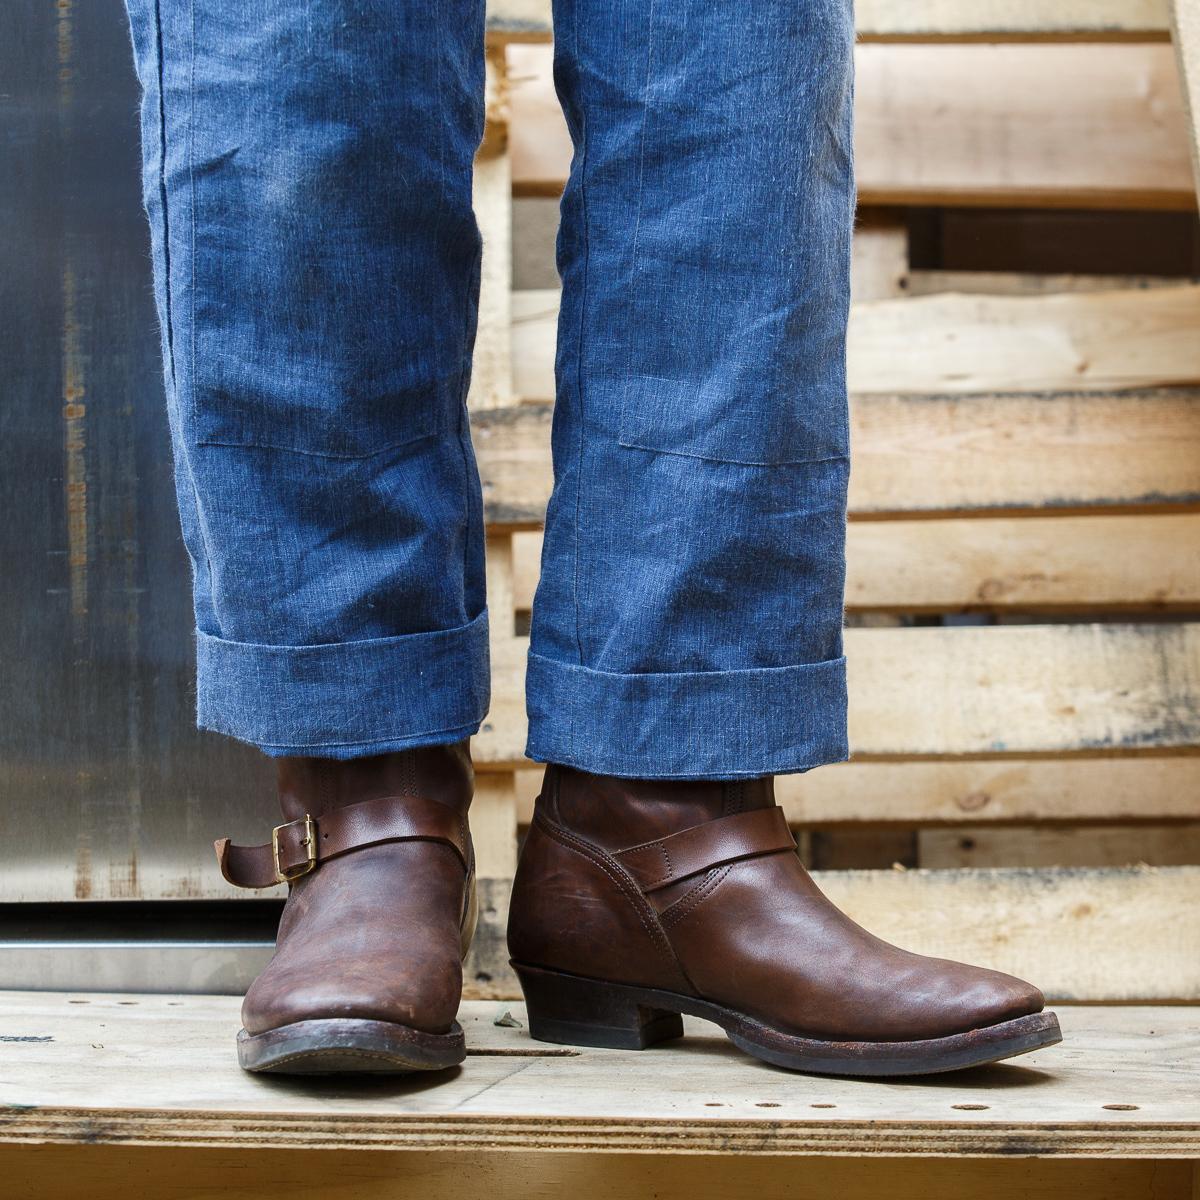 Clinch - Engineer Boot - Brown Overdye Horsebutt - Jeremy Wear-Onbody-5760 x 3840-01.jpg